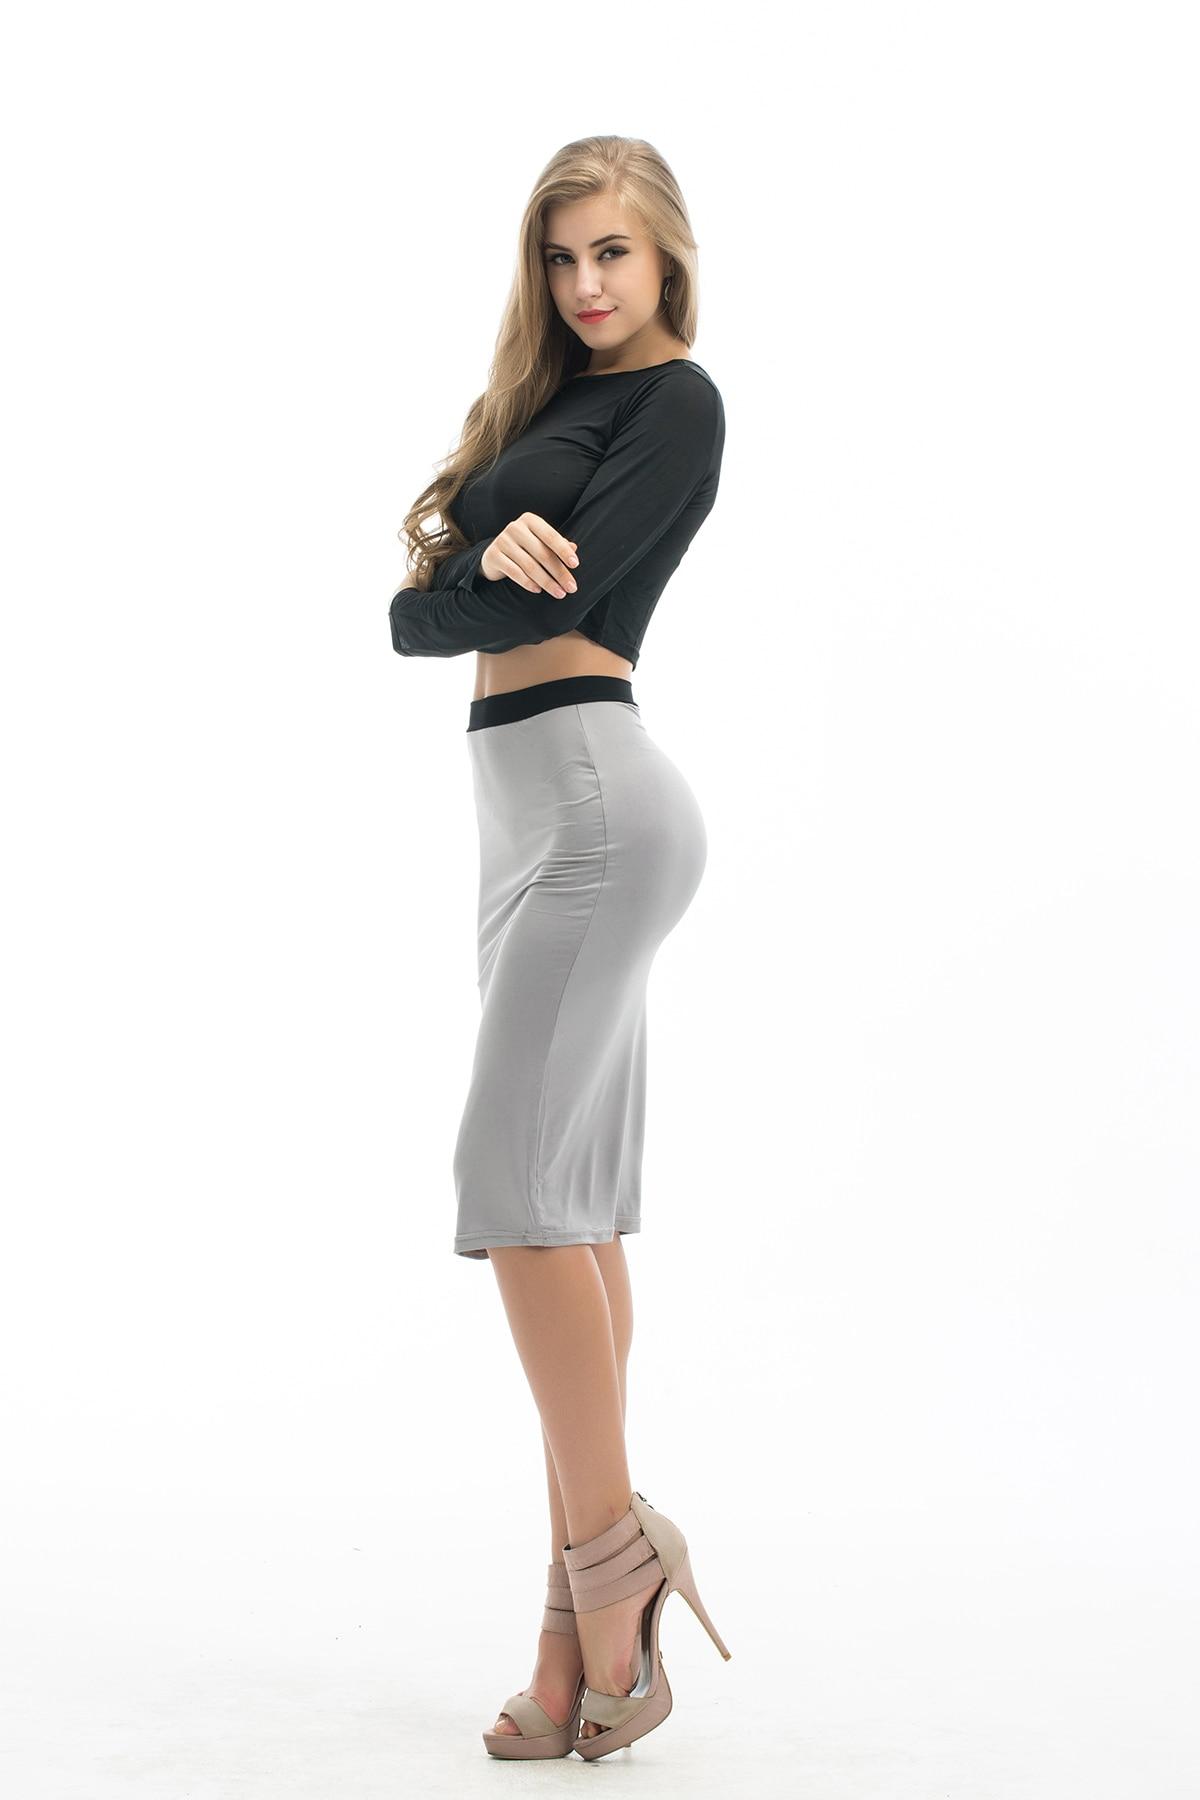 Aliexpress.com : Buy 2016 New Fashion Sexy Crop Top Midi Pencil ...